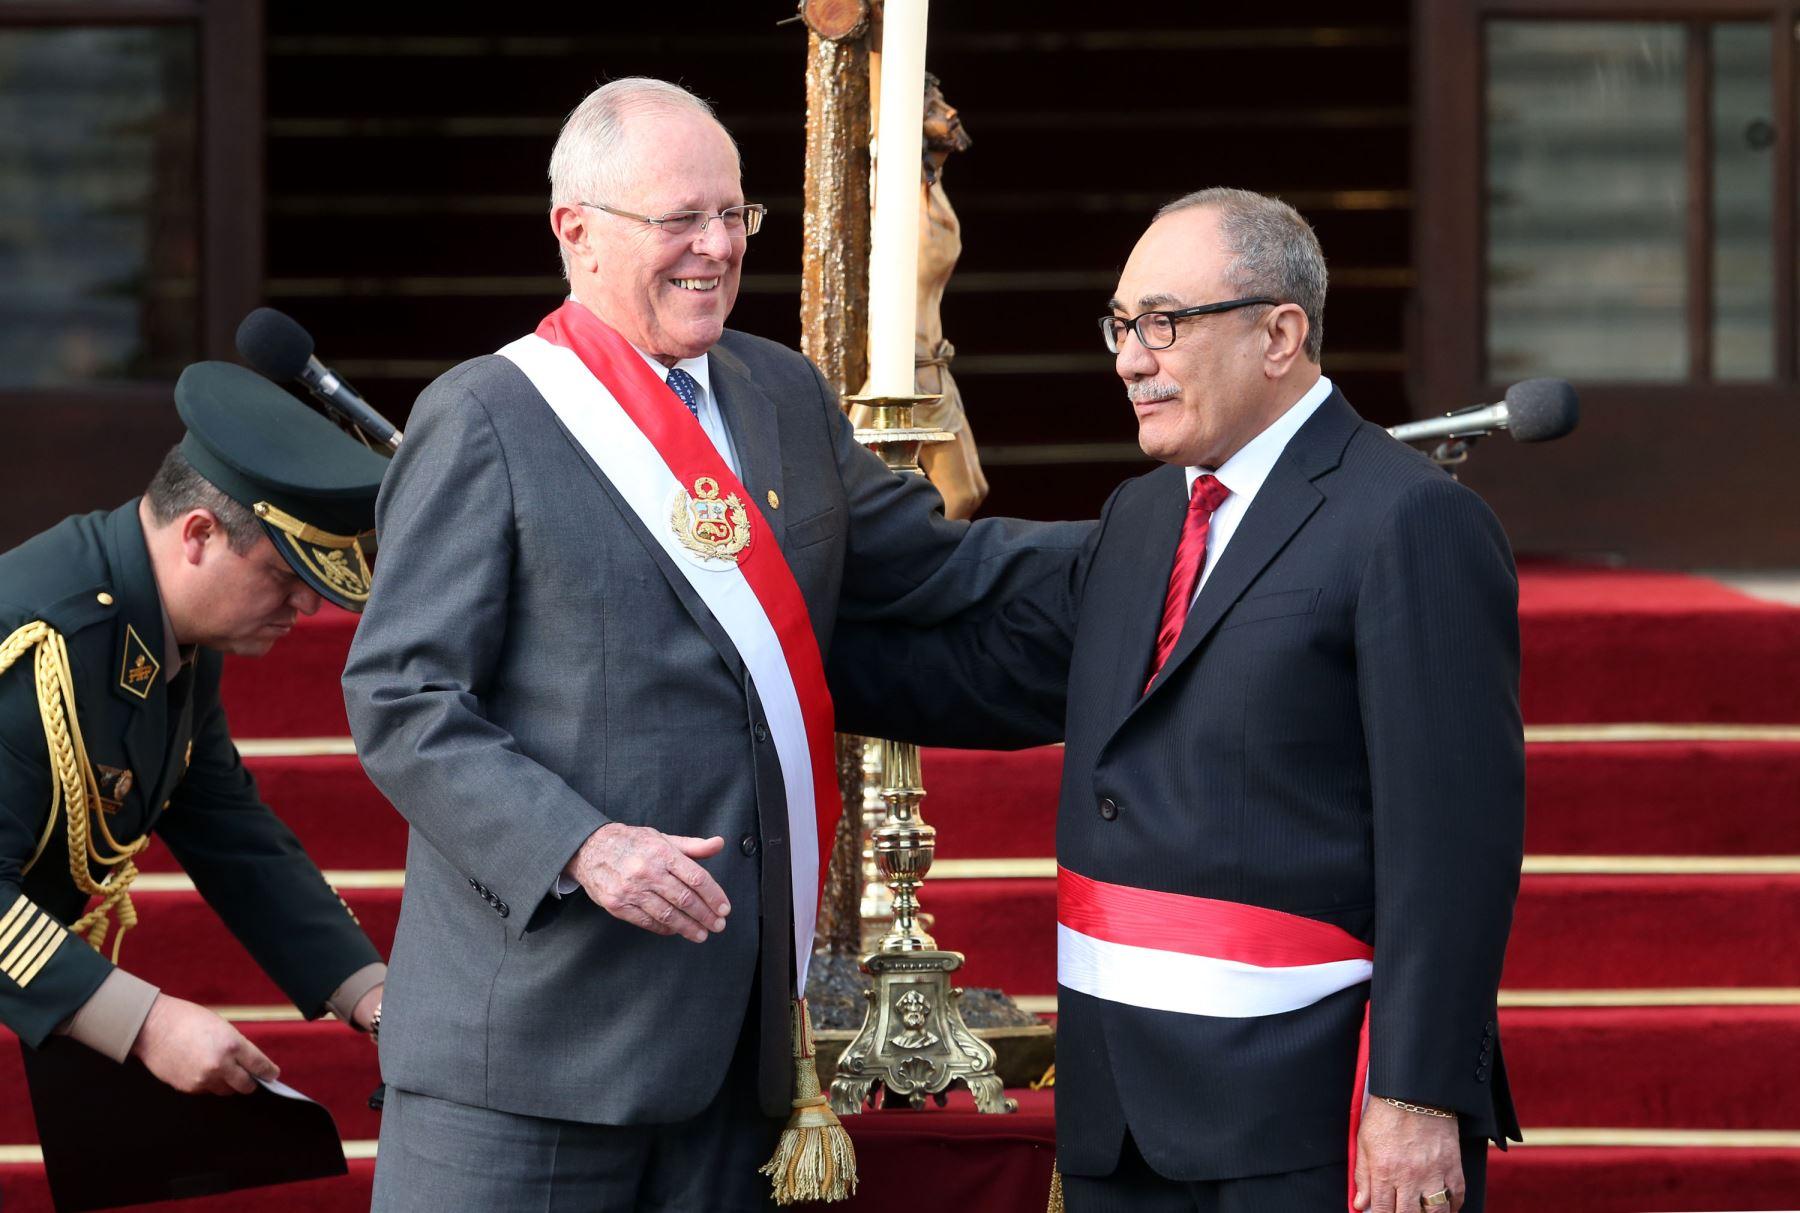 Idel Vexler juramentó como ministro de Educación. Foto: ANDINA/ Vidal Tarqui